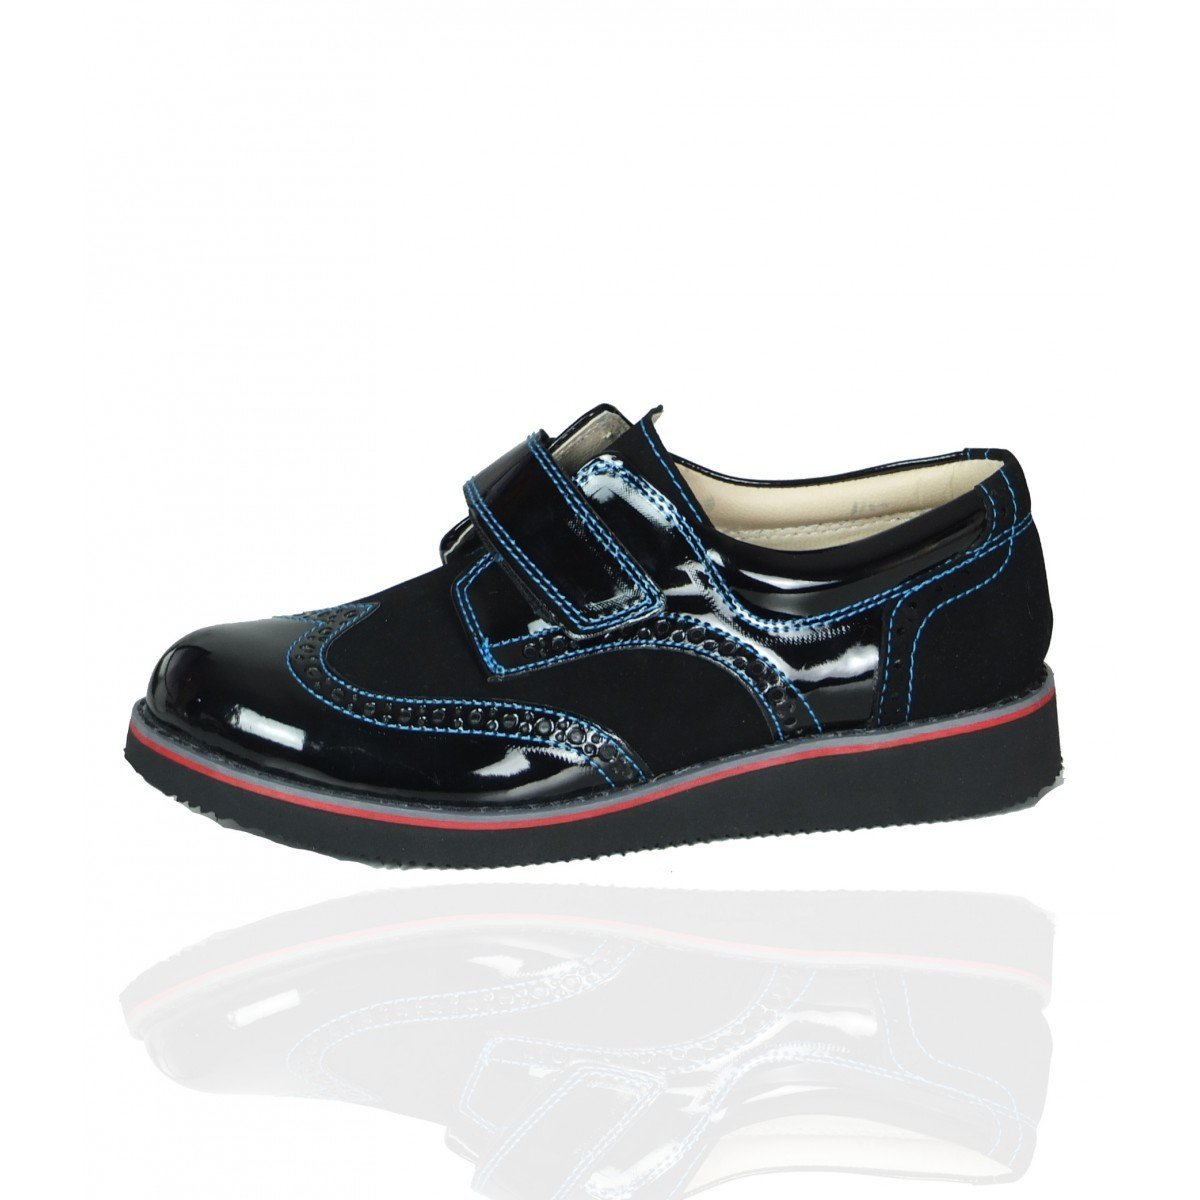 Venice SIRRI Boys Black /& Blue Patent Suede Formal Brogue Velcro Shoes